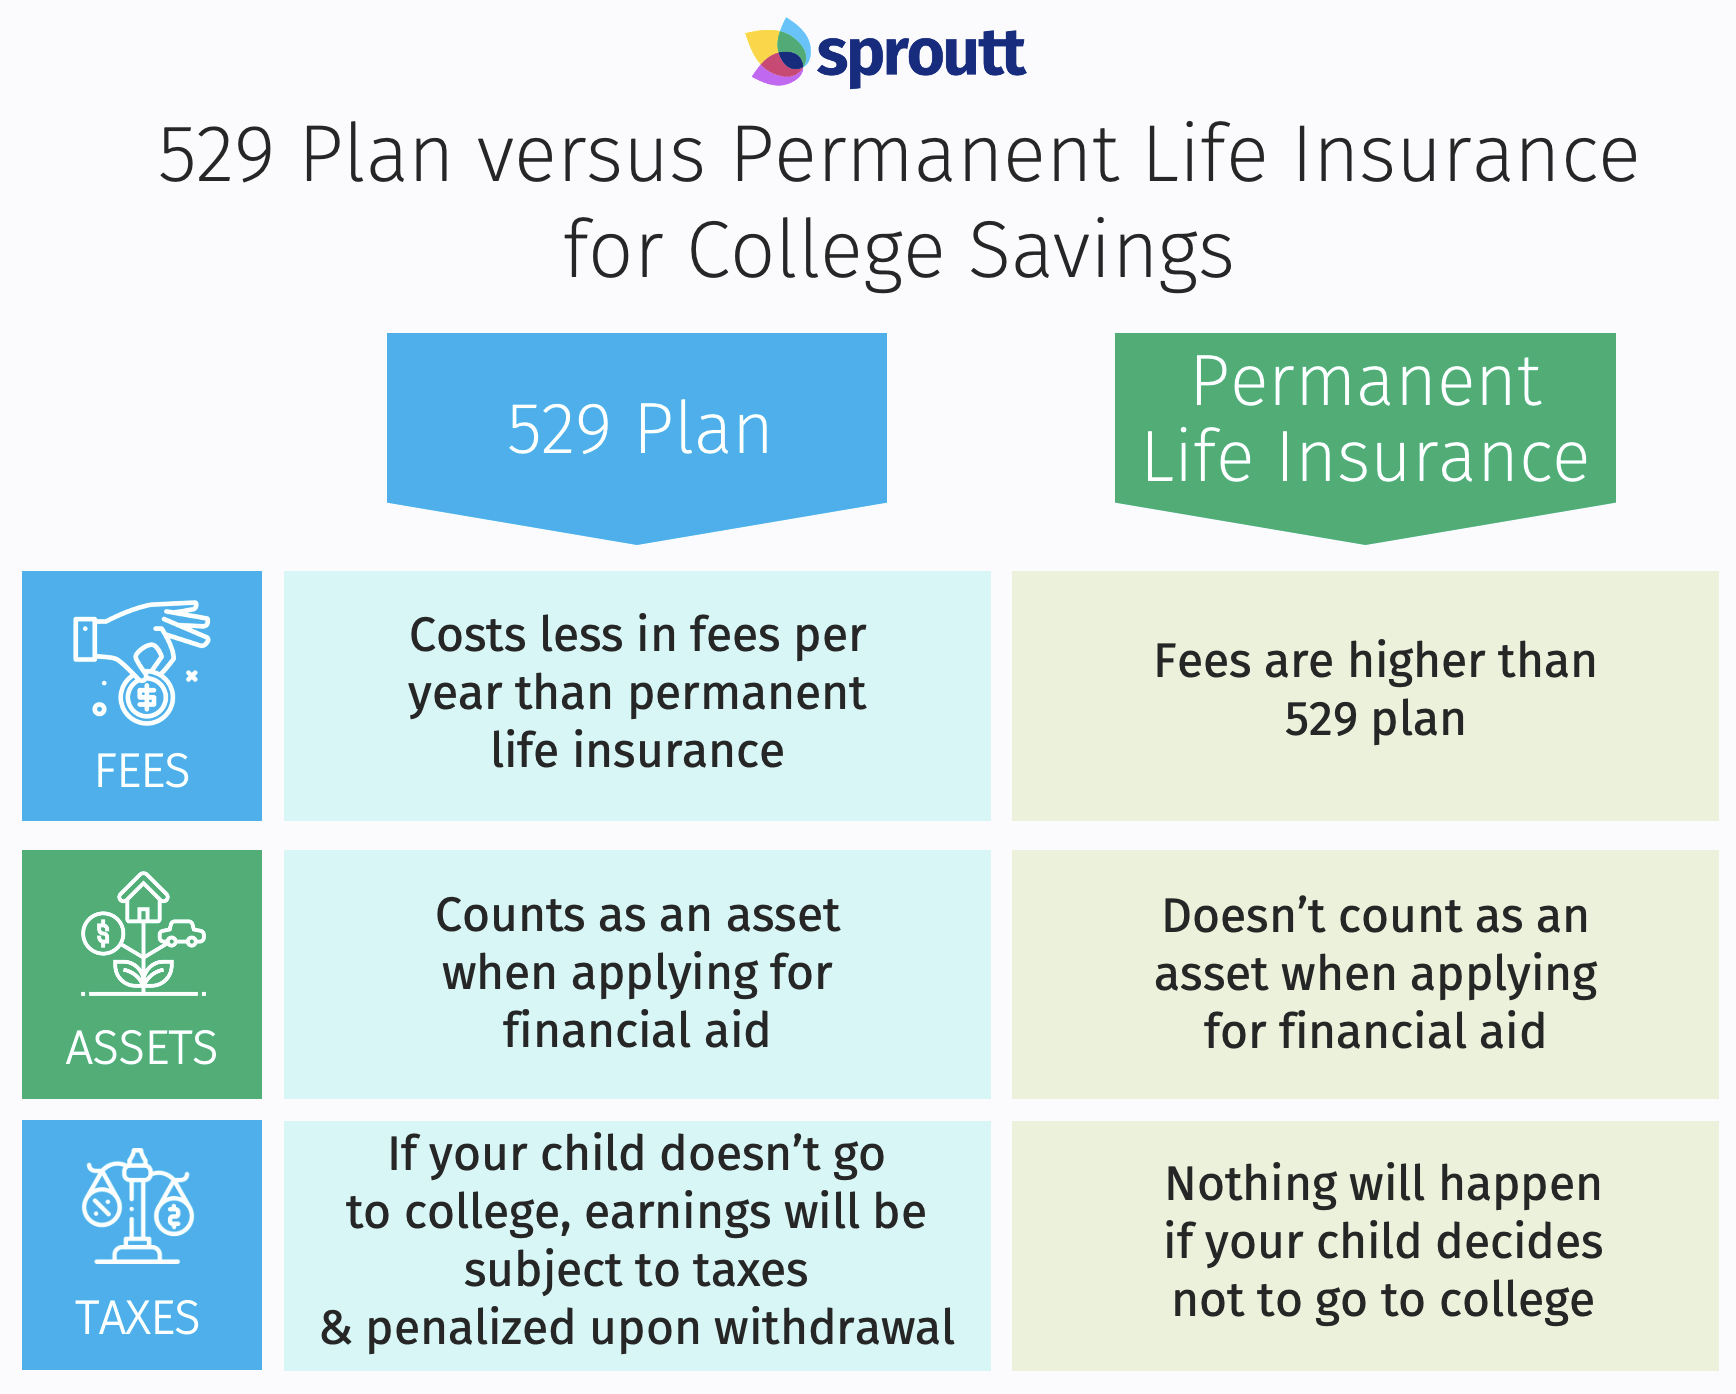 529 Plan versus Permanent Life Insurance for College Savings infographics